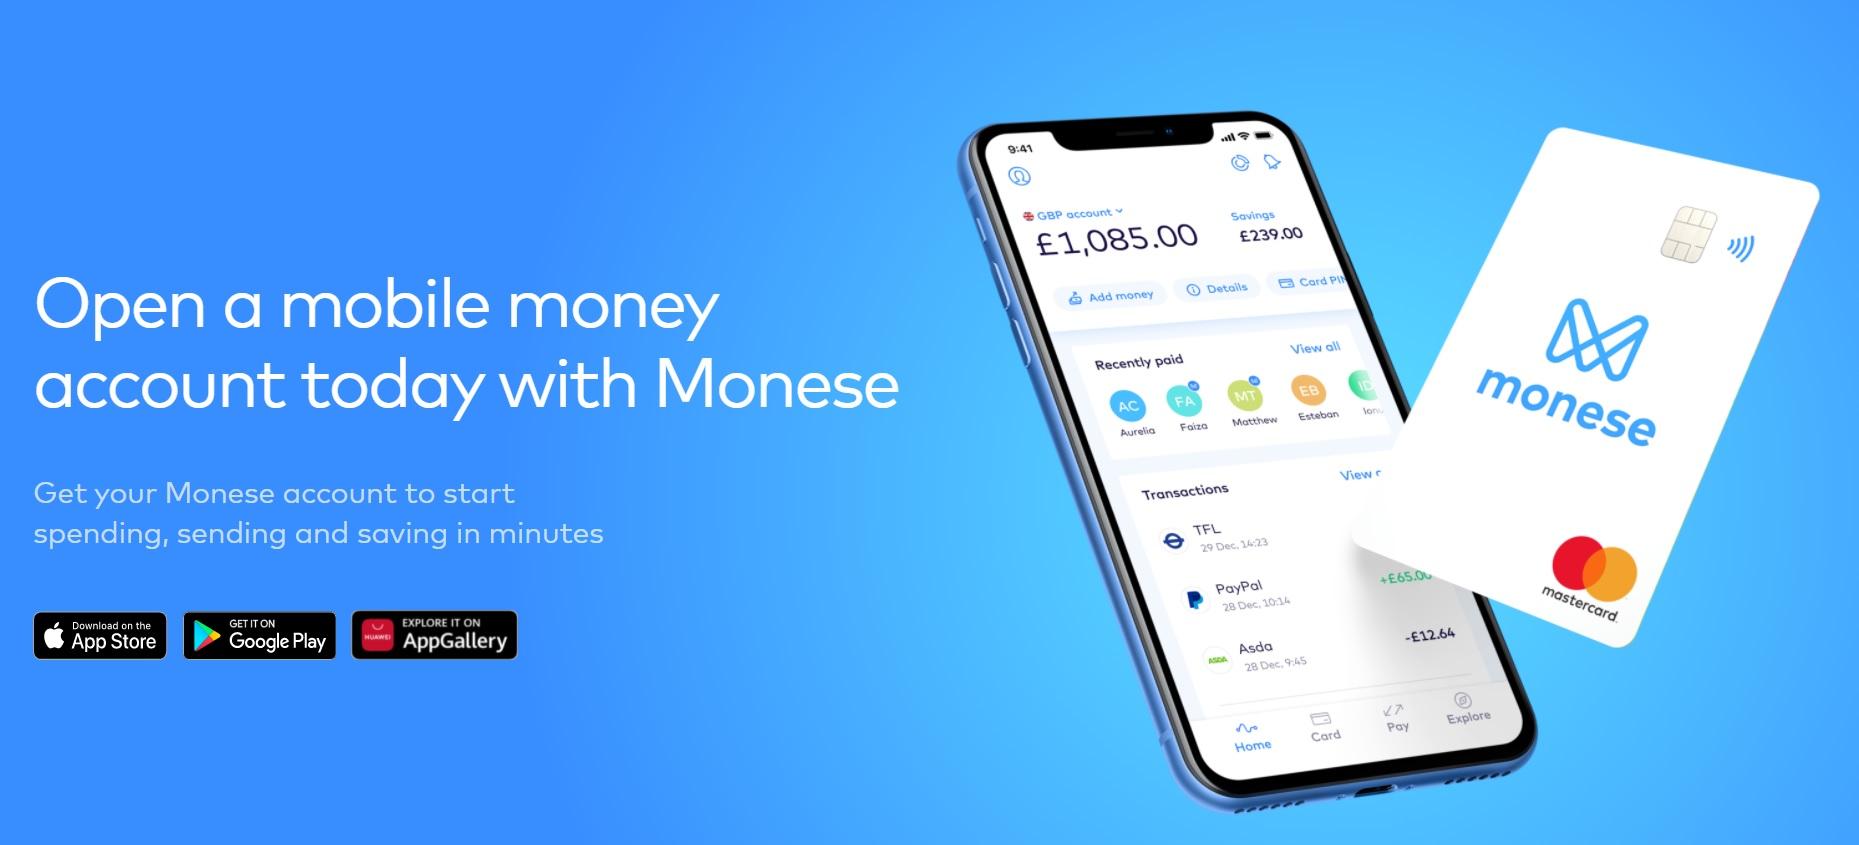 free monese card